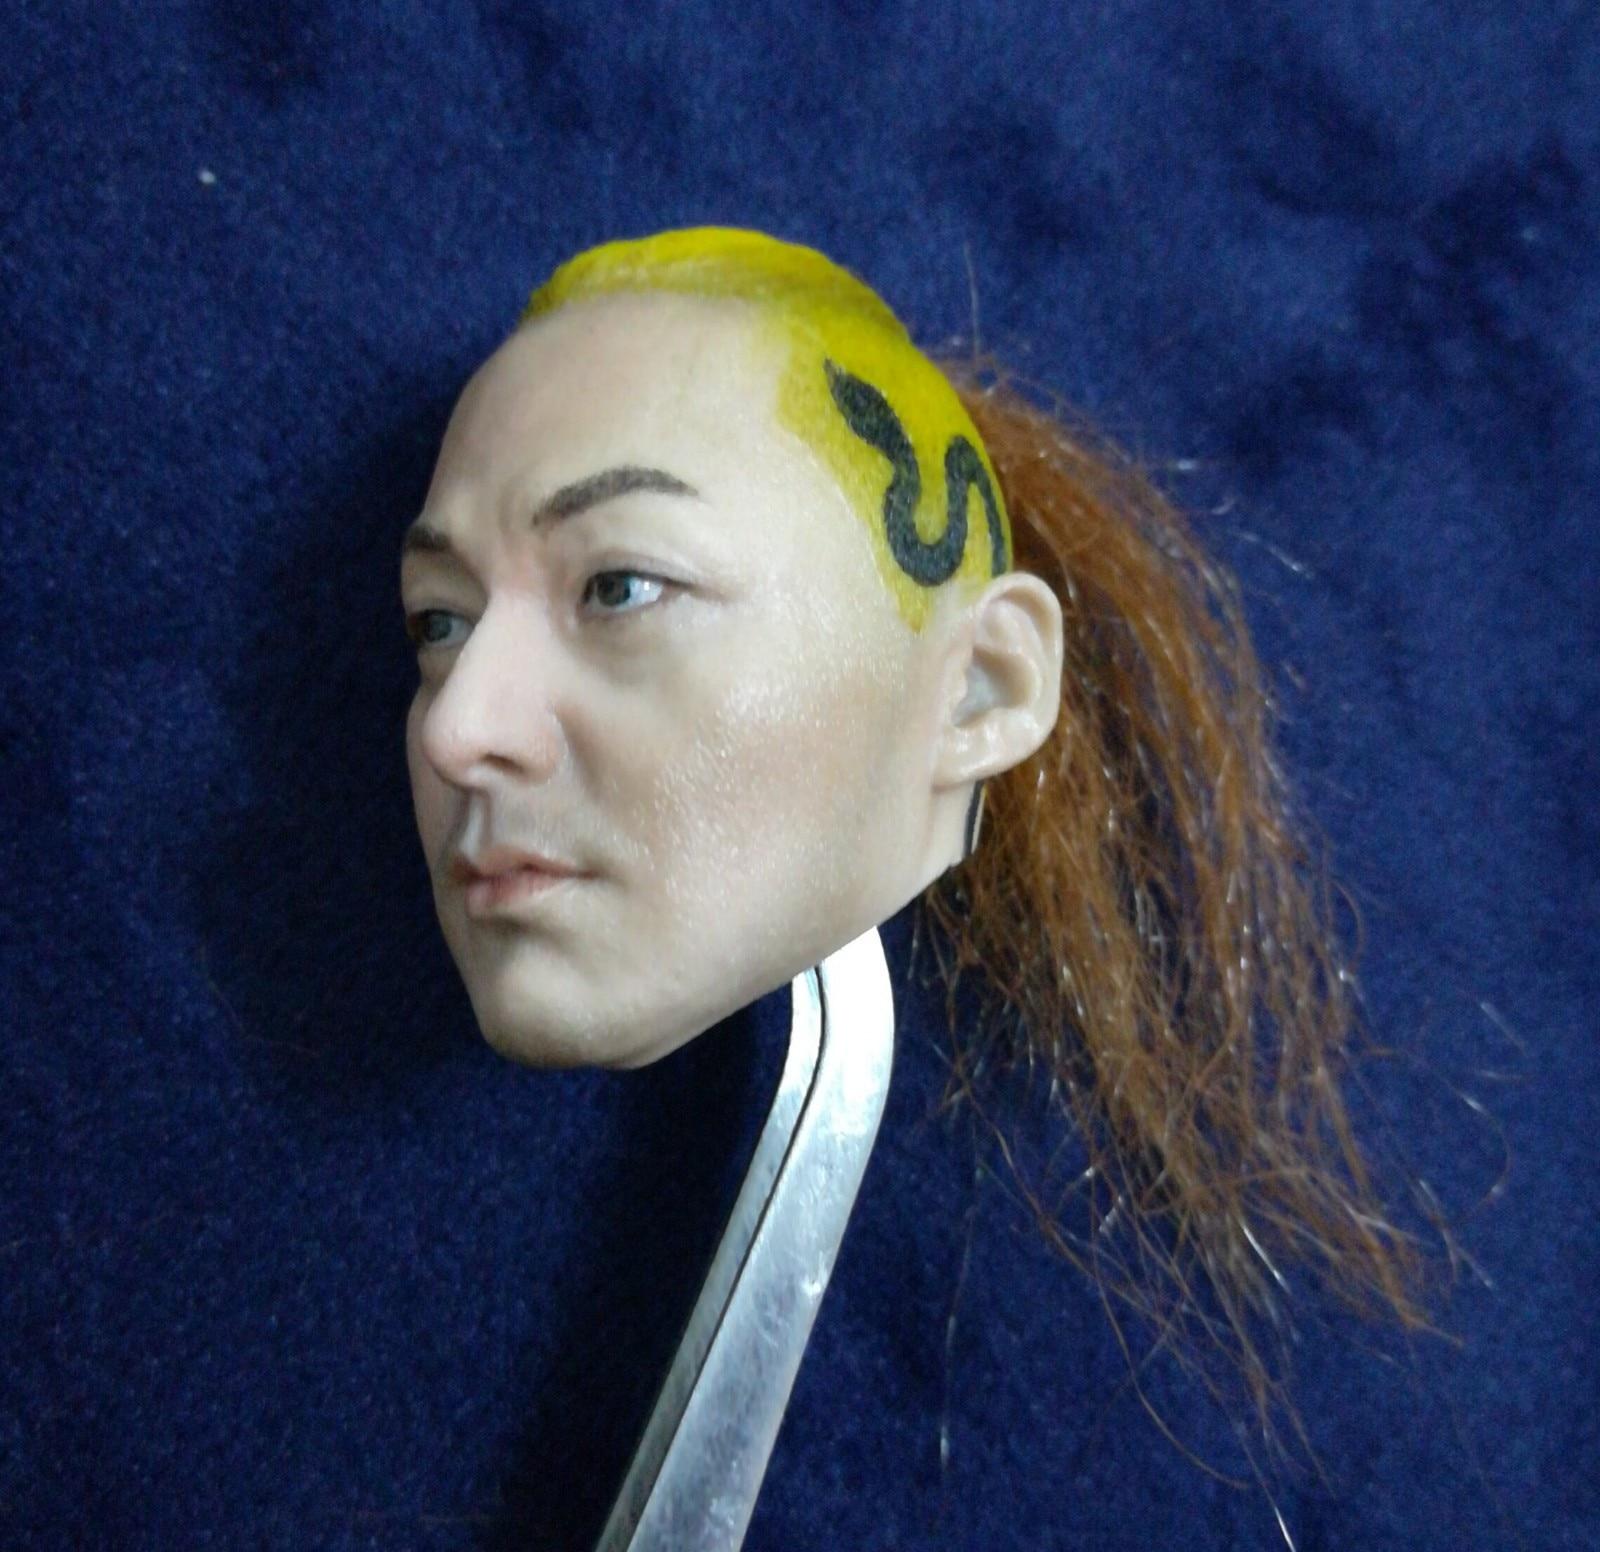 1/6 Male Japanese Warrior Samurai Head Sculpt Models for 12'' Action Figures Bodies DIY